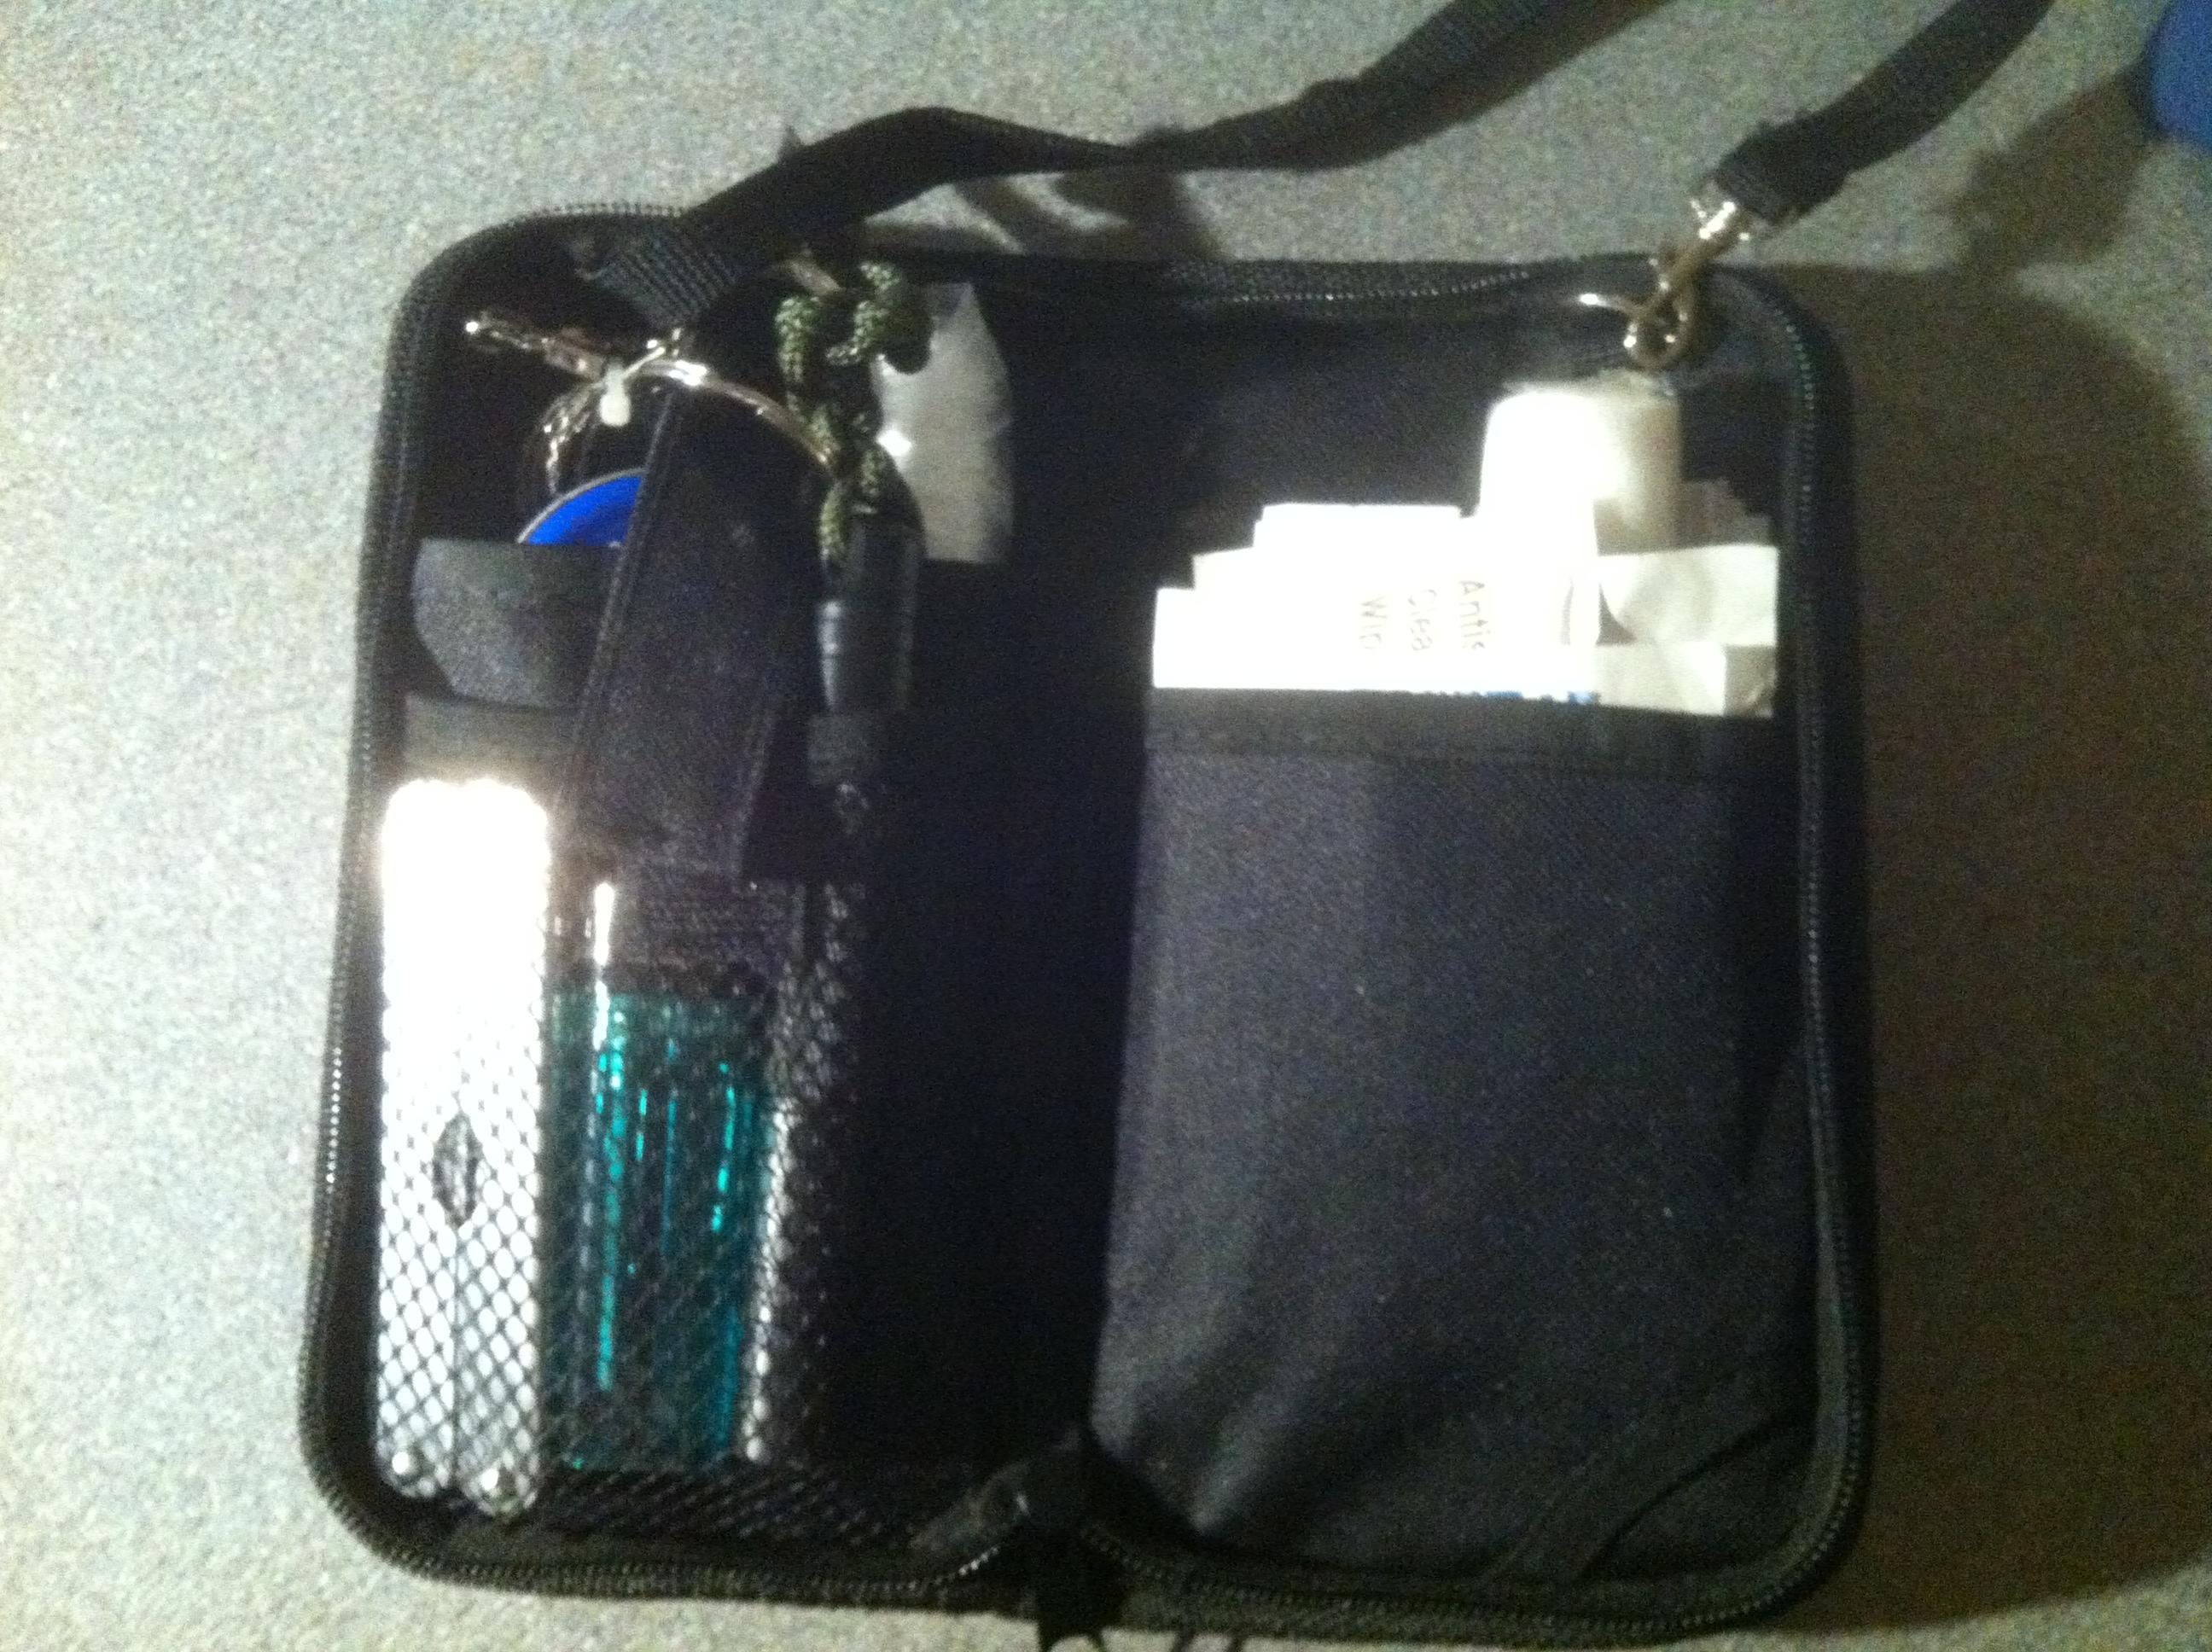 Quick Pocket Pouch (QPP)